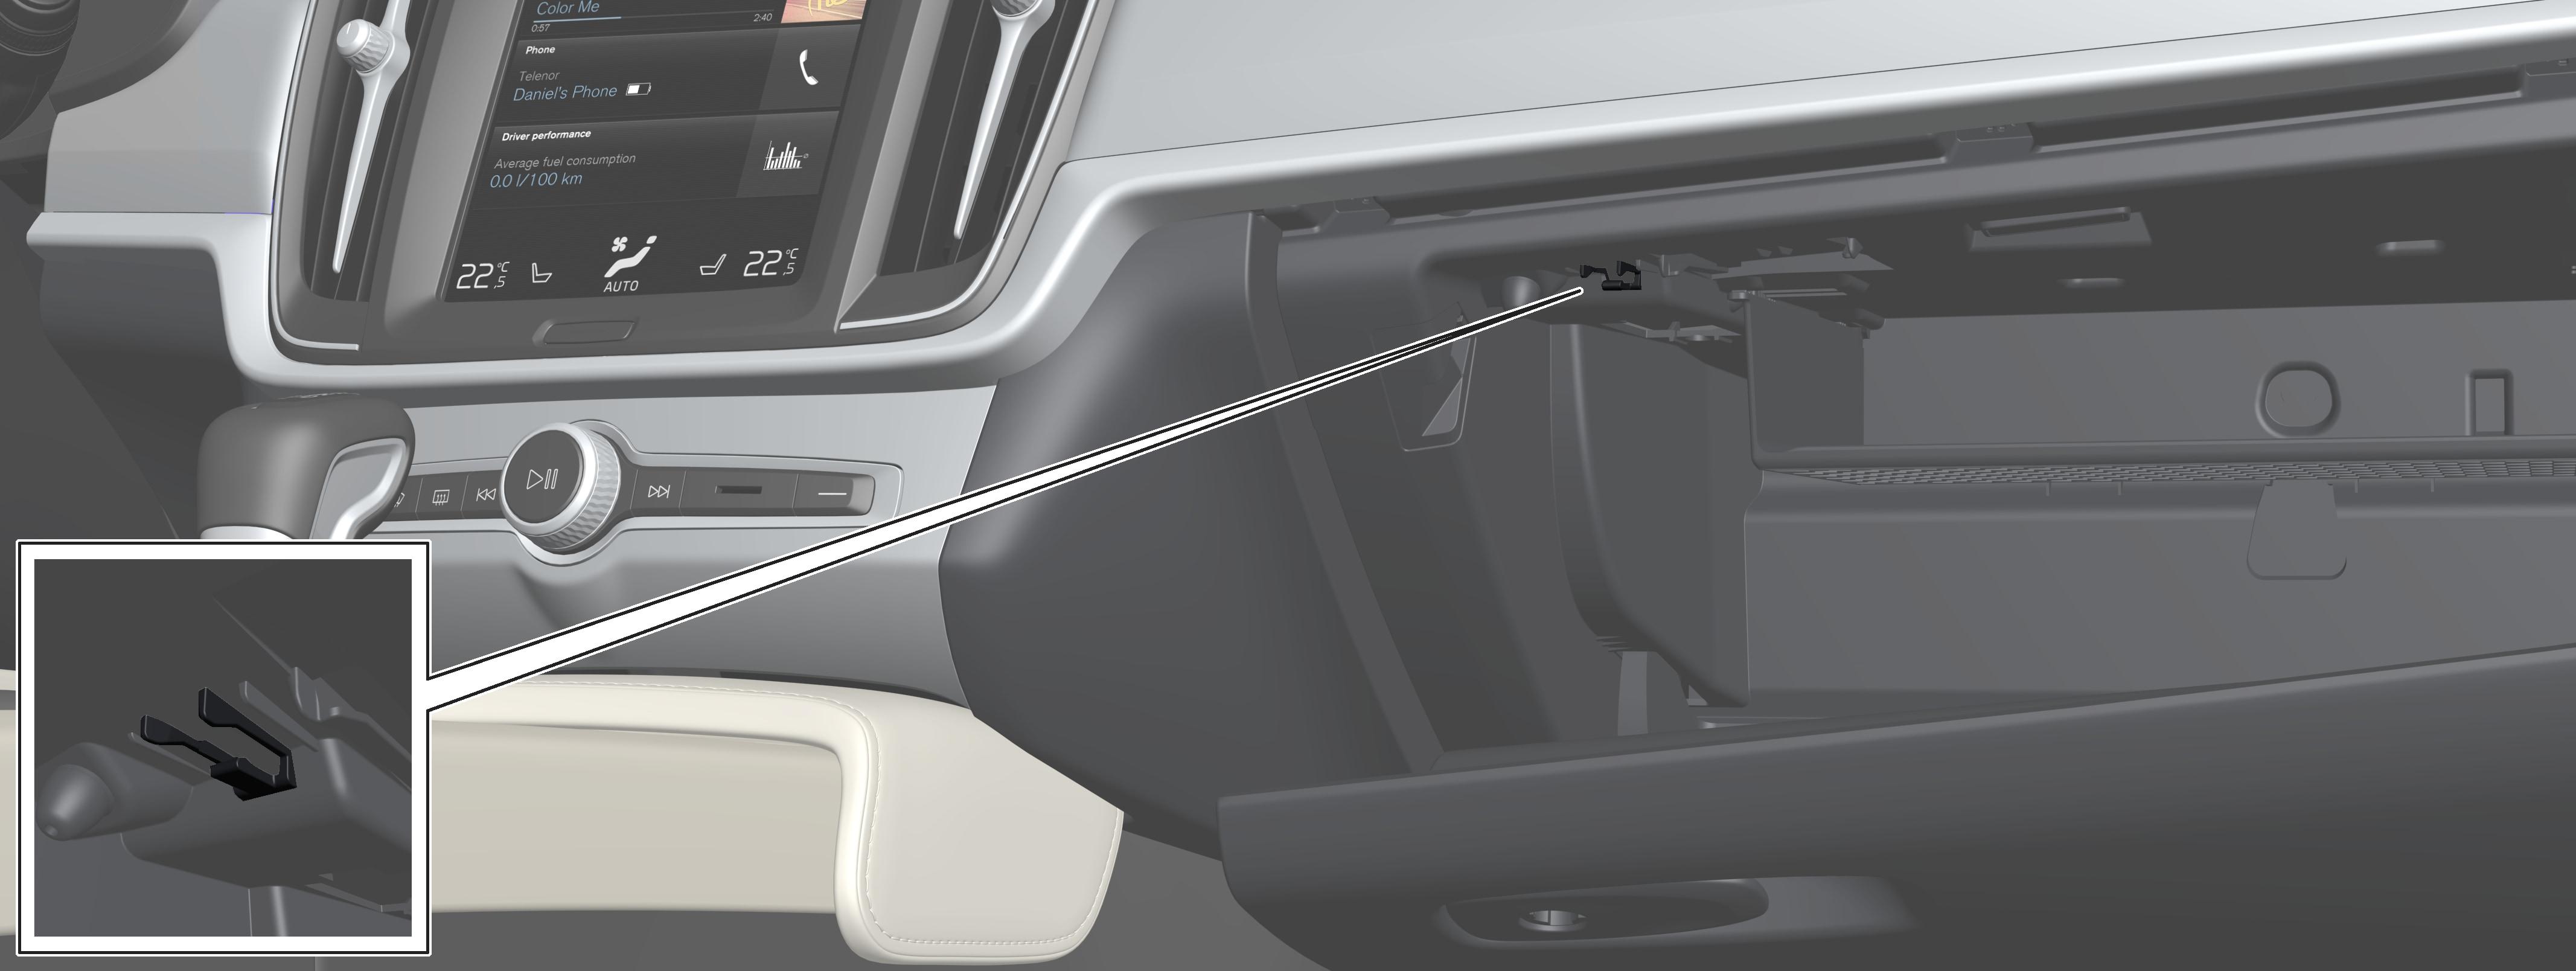 P5-1617-Interior-Gloveboxkey storage